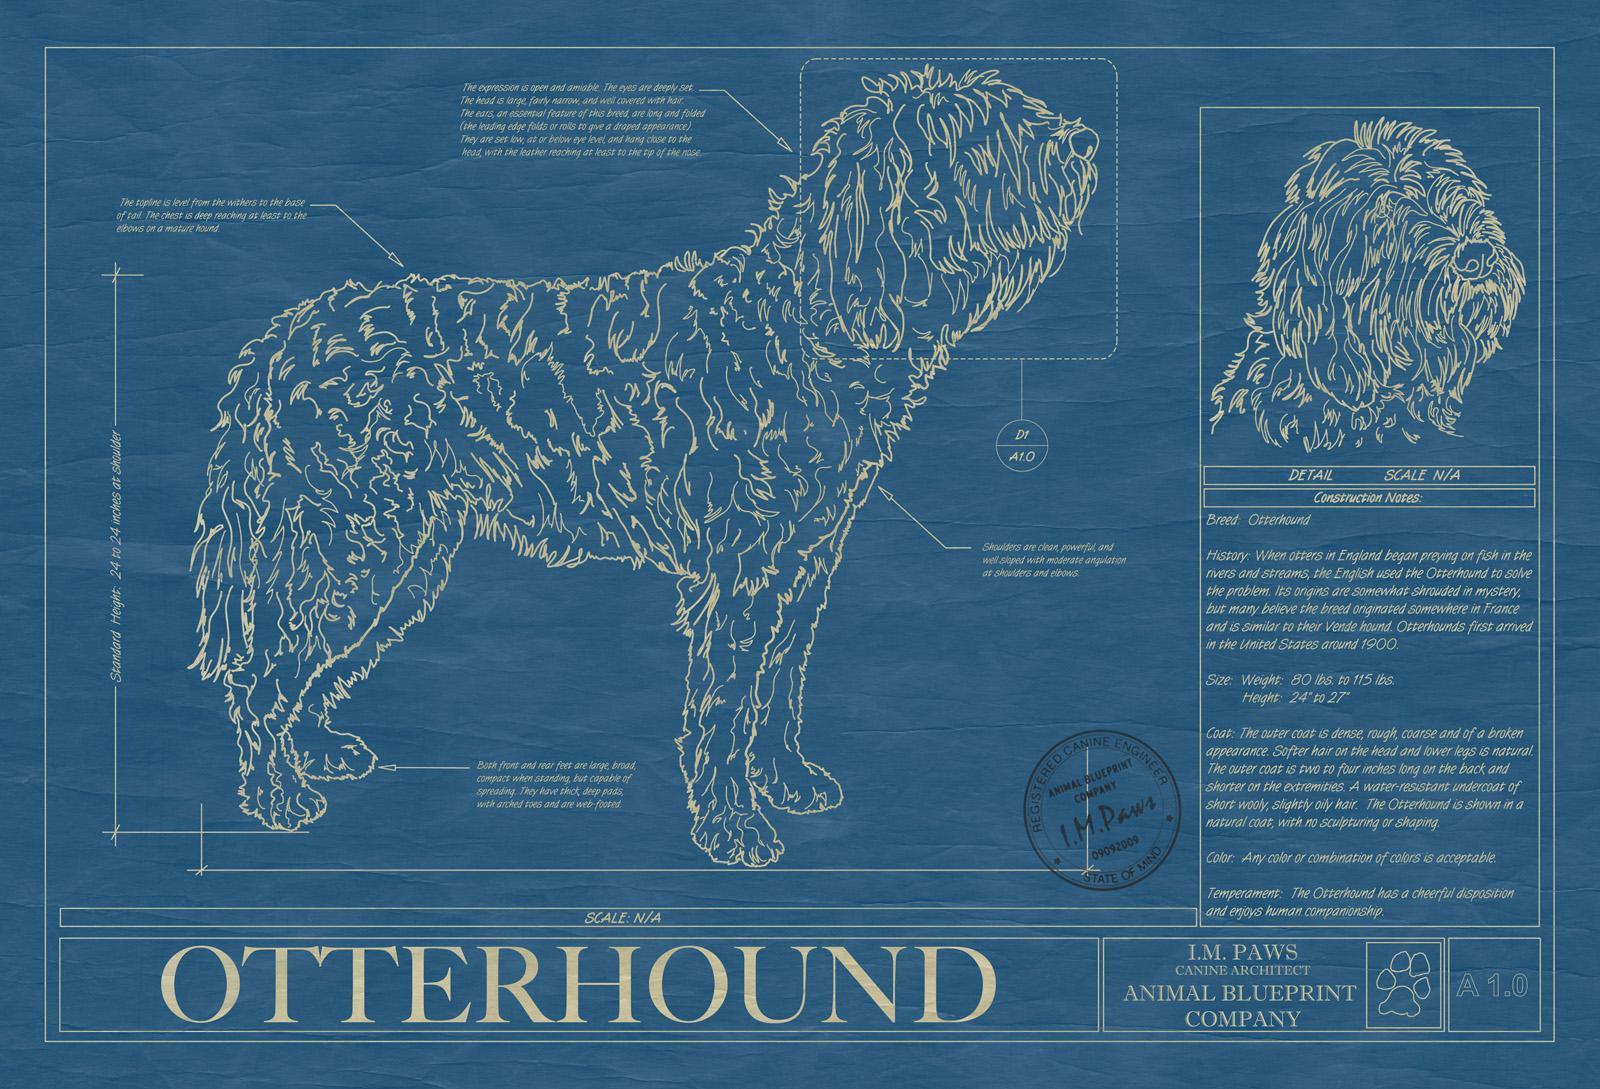 Otterhound animal blueprint company otterhound dog blueprint malvernweather Gallery